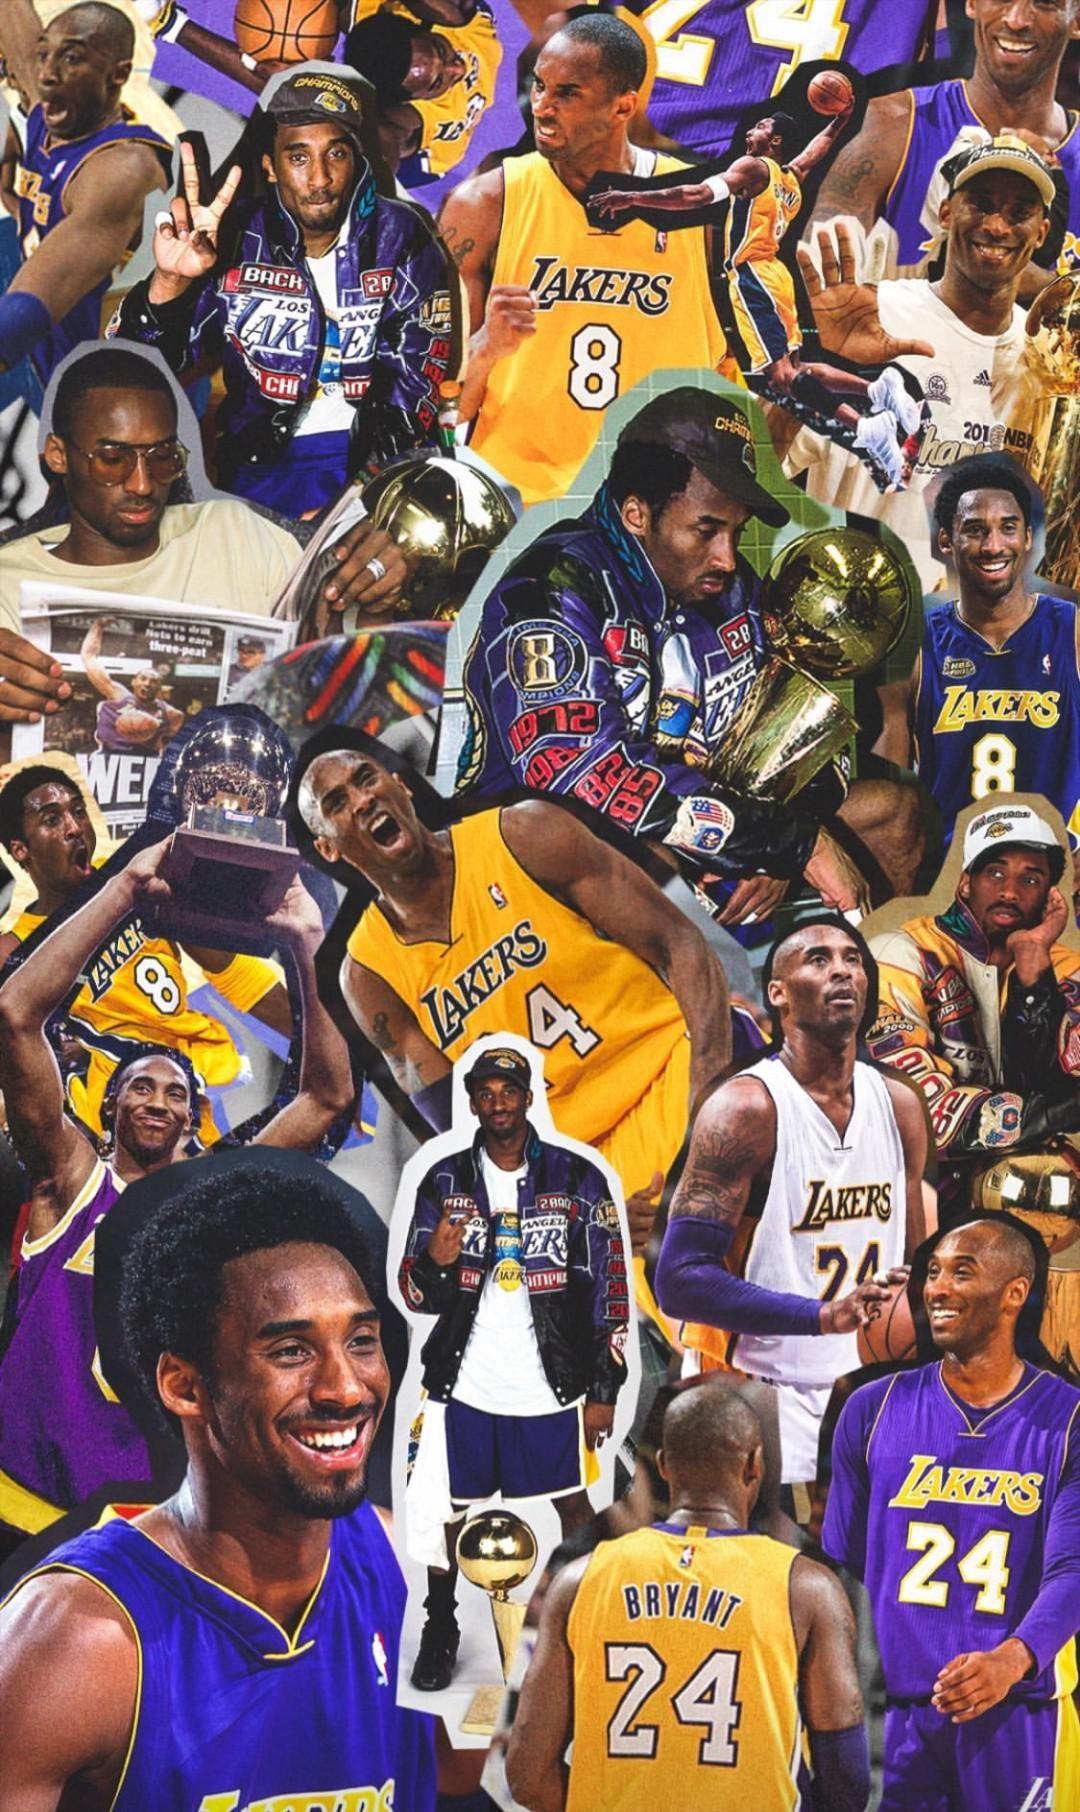 Black Mamba Kobe Bryant Pictures Kobe Bryant Poster Kobe Bryant Wallpaper Black mamba basketball black mamba kobe